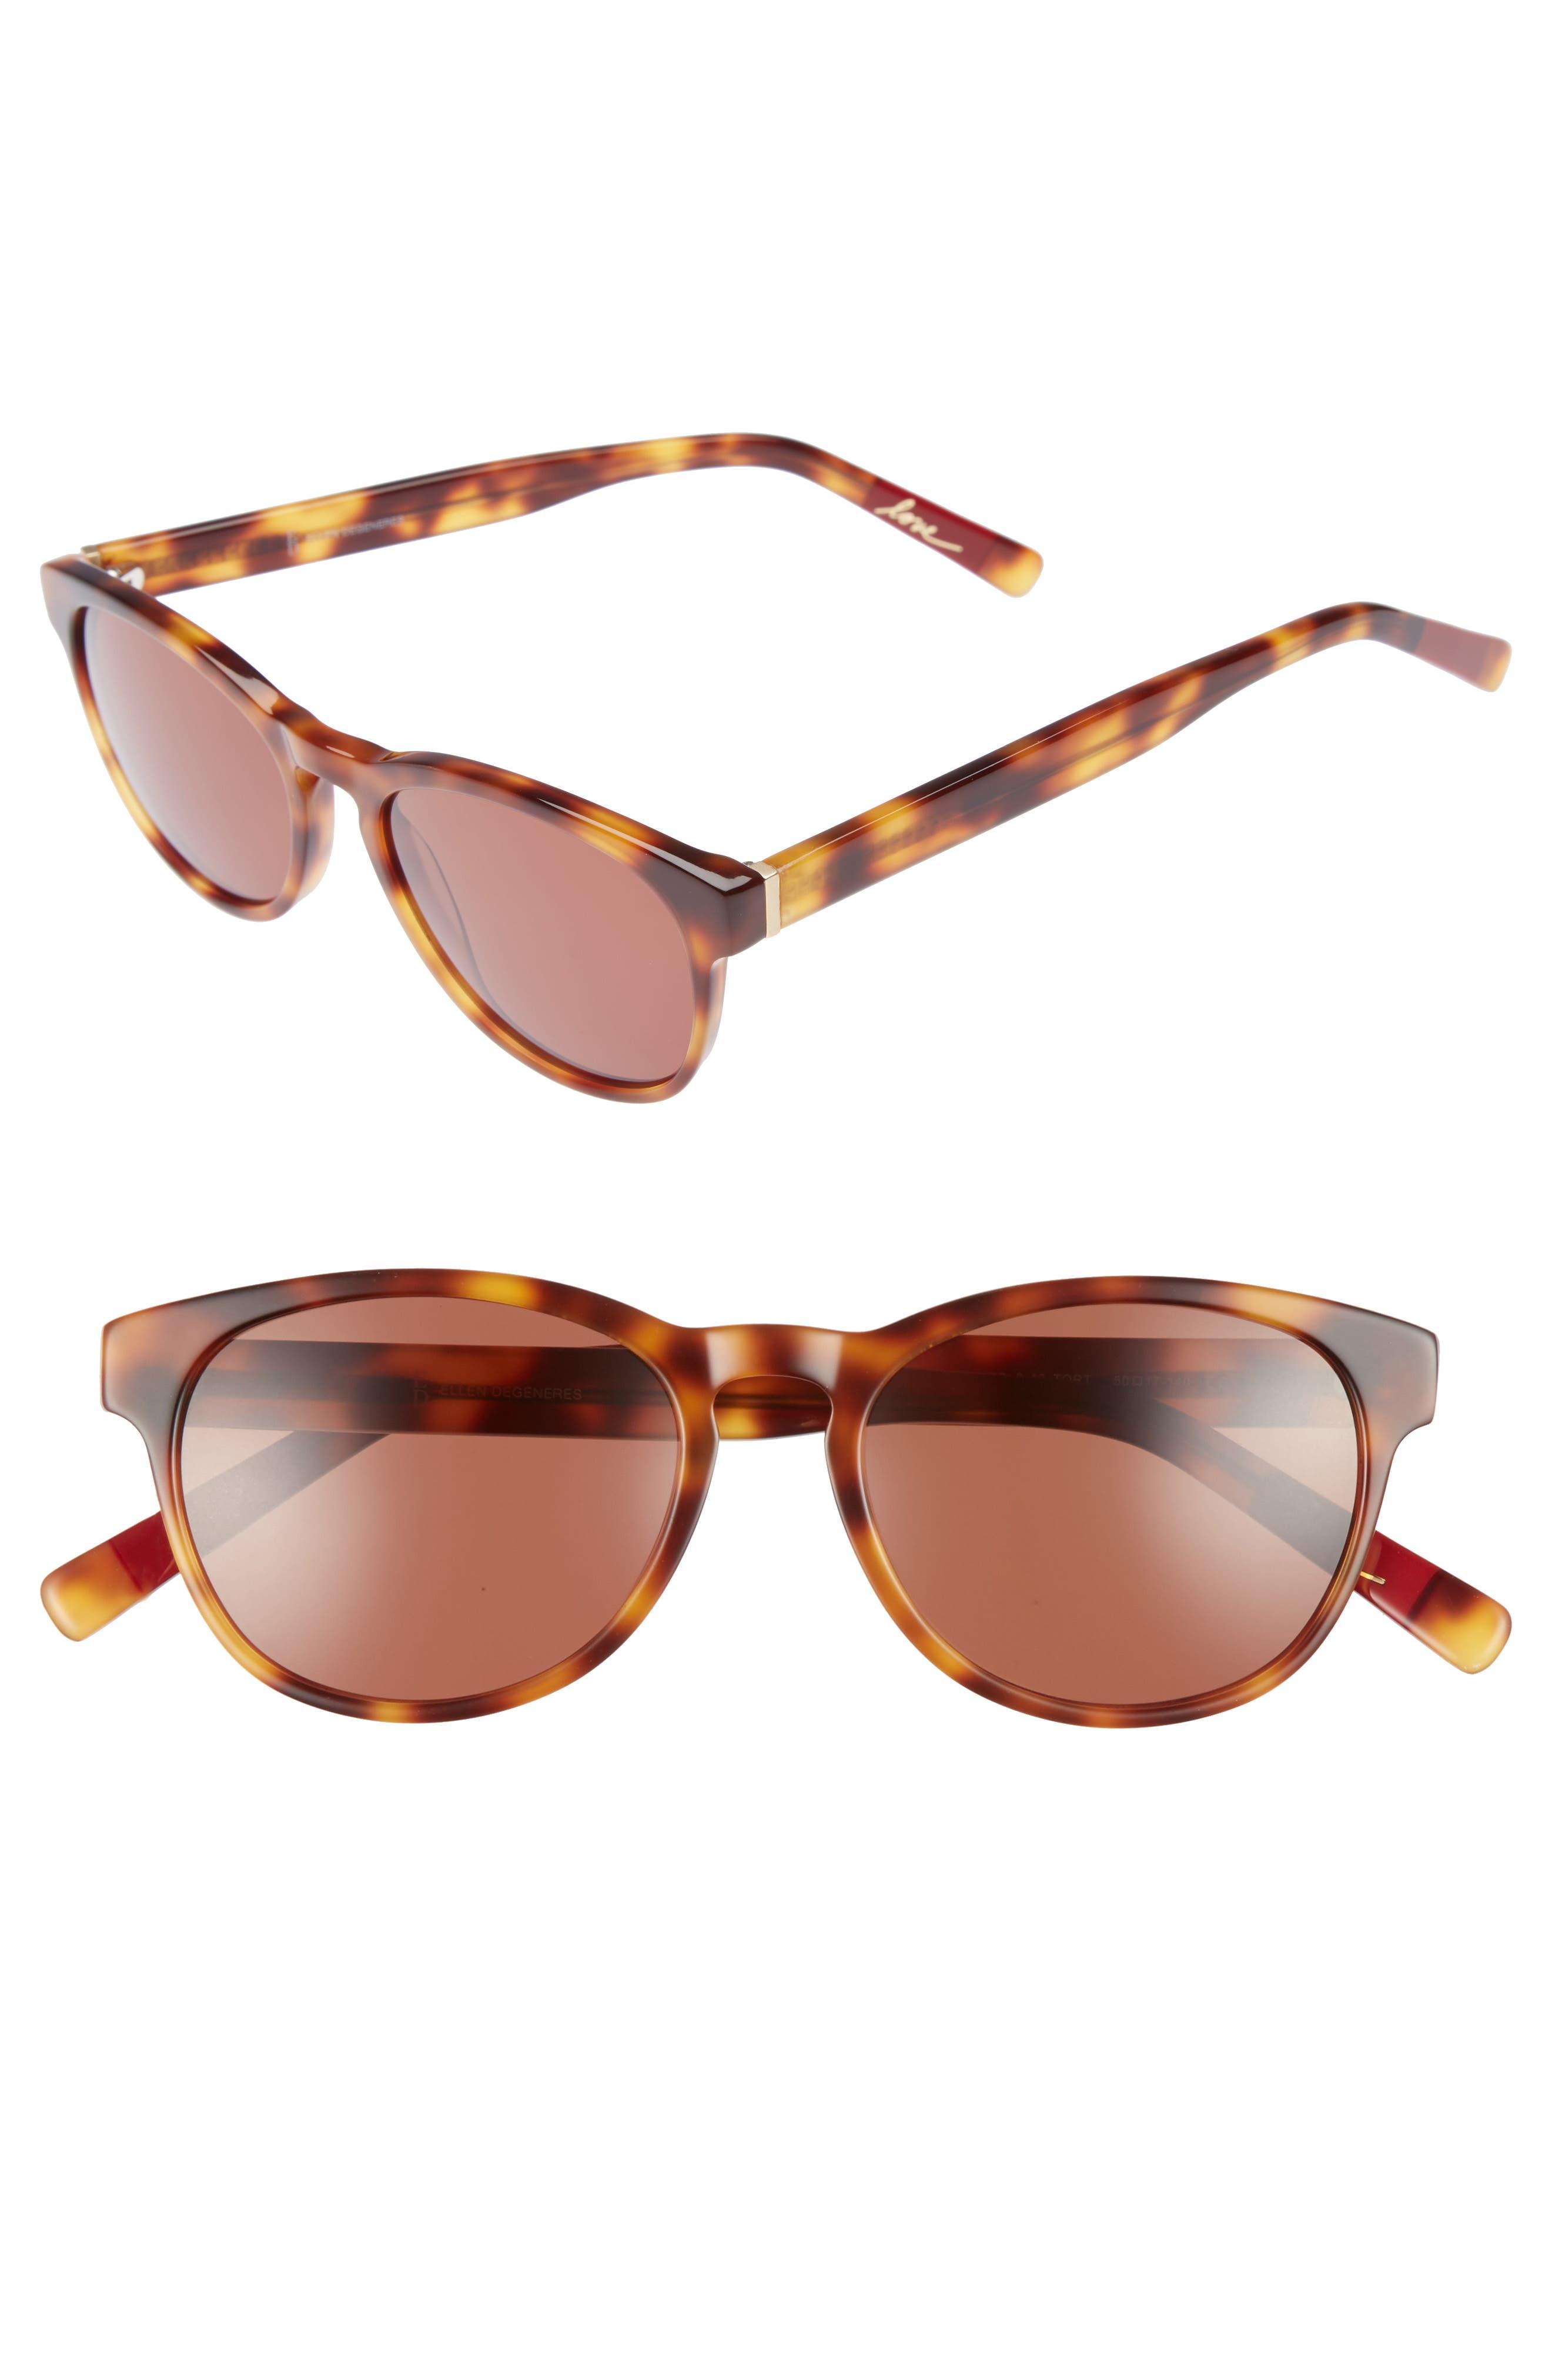 50mm Gradient Sunglasses,                         Main,                         color, Tortoise